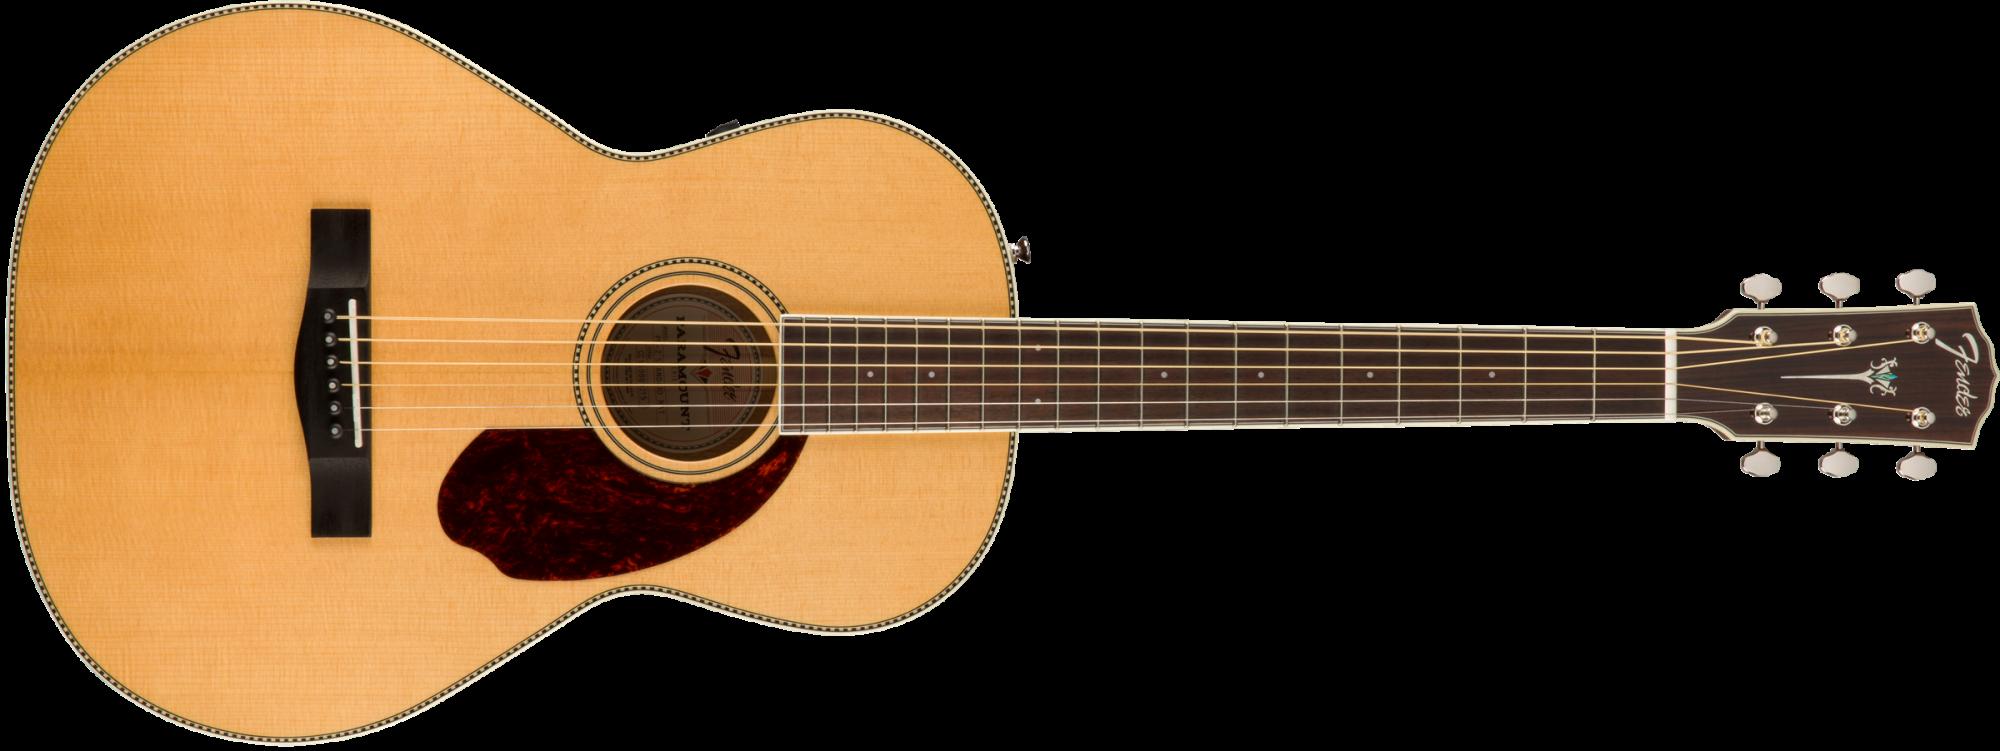 Fender PM-2 Standard, Parlor Acoustic Electric Guitar, Natural Finish